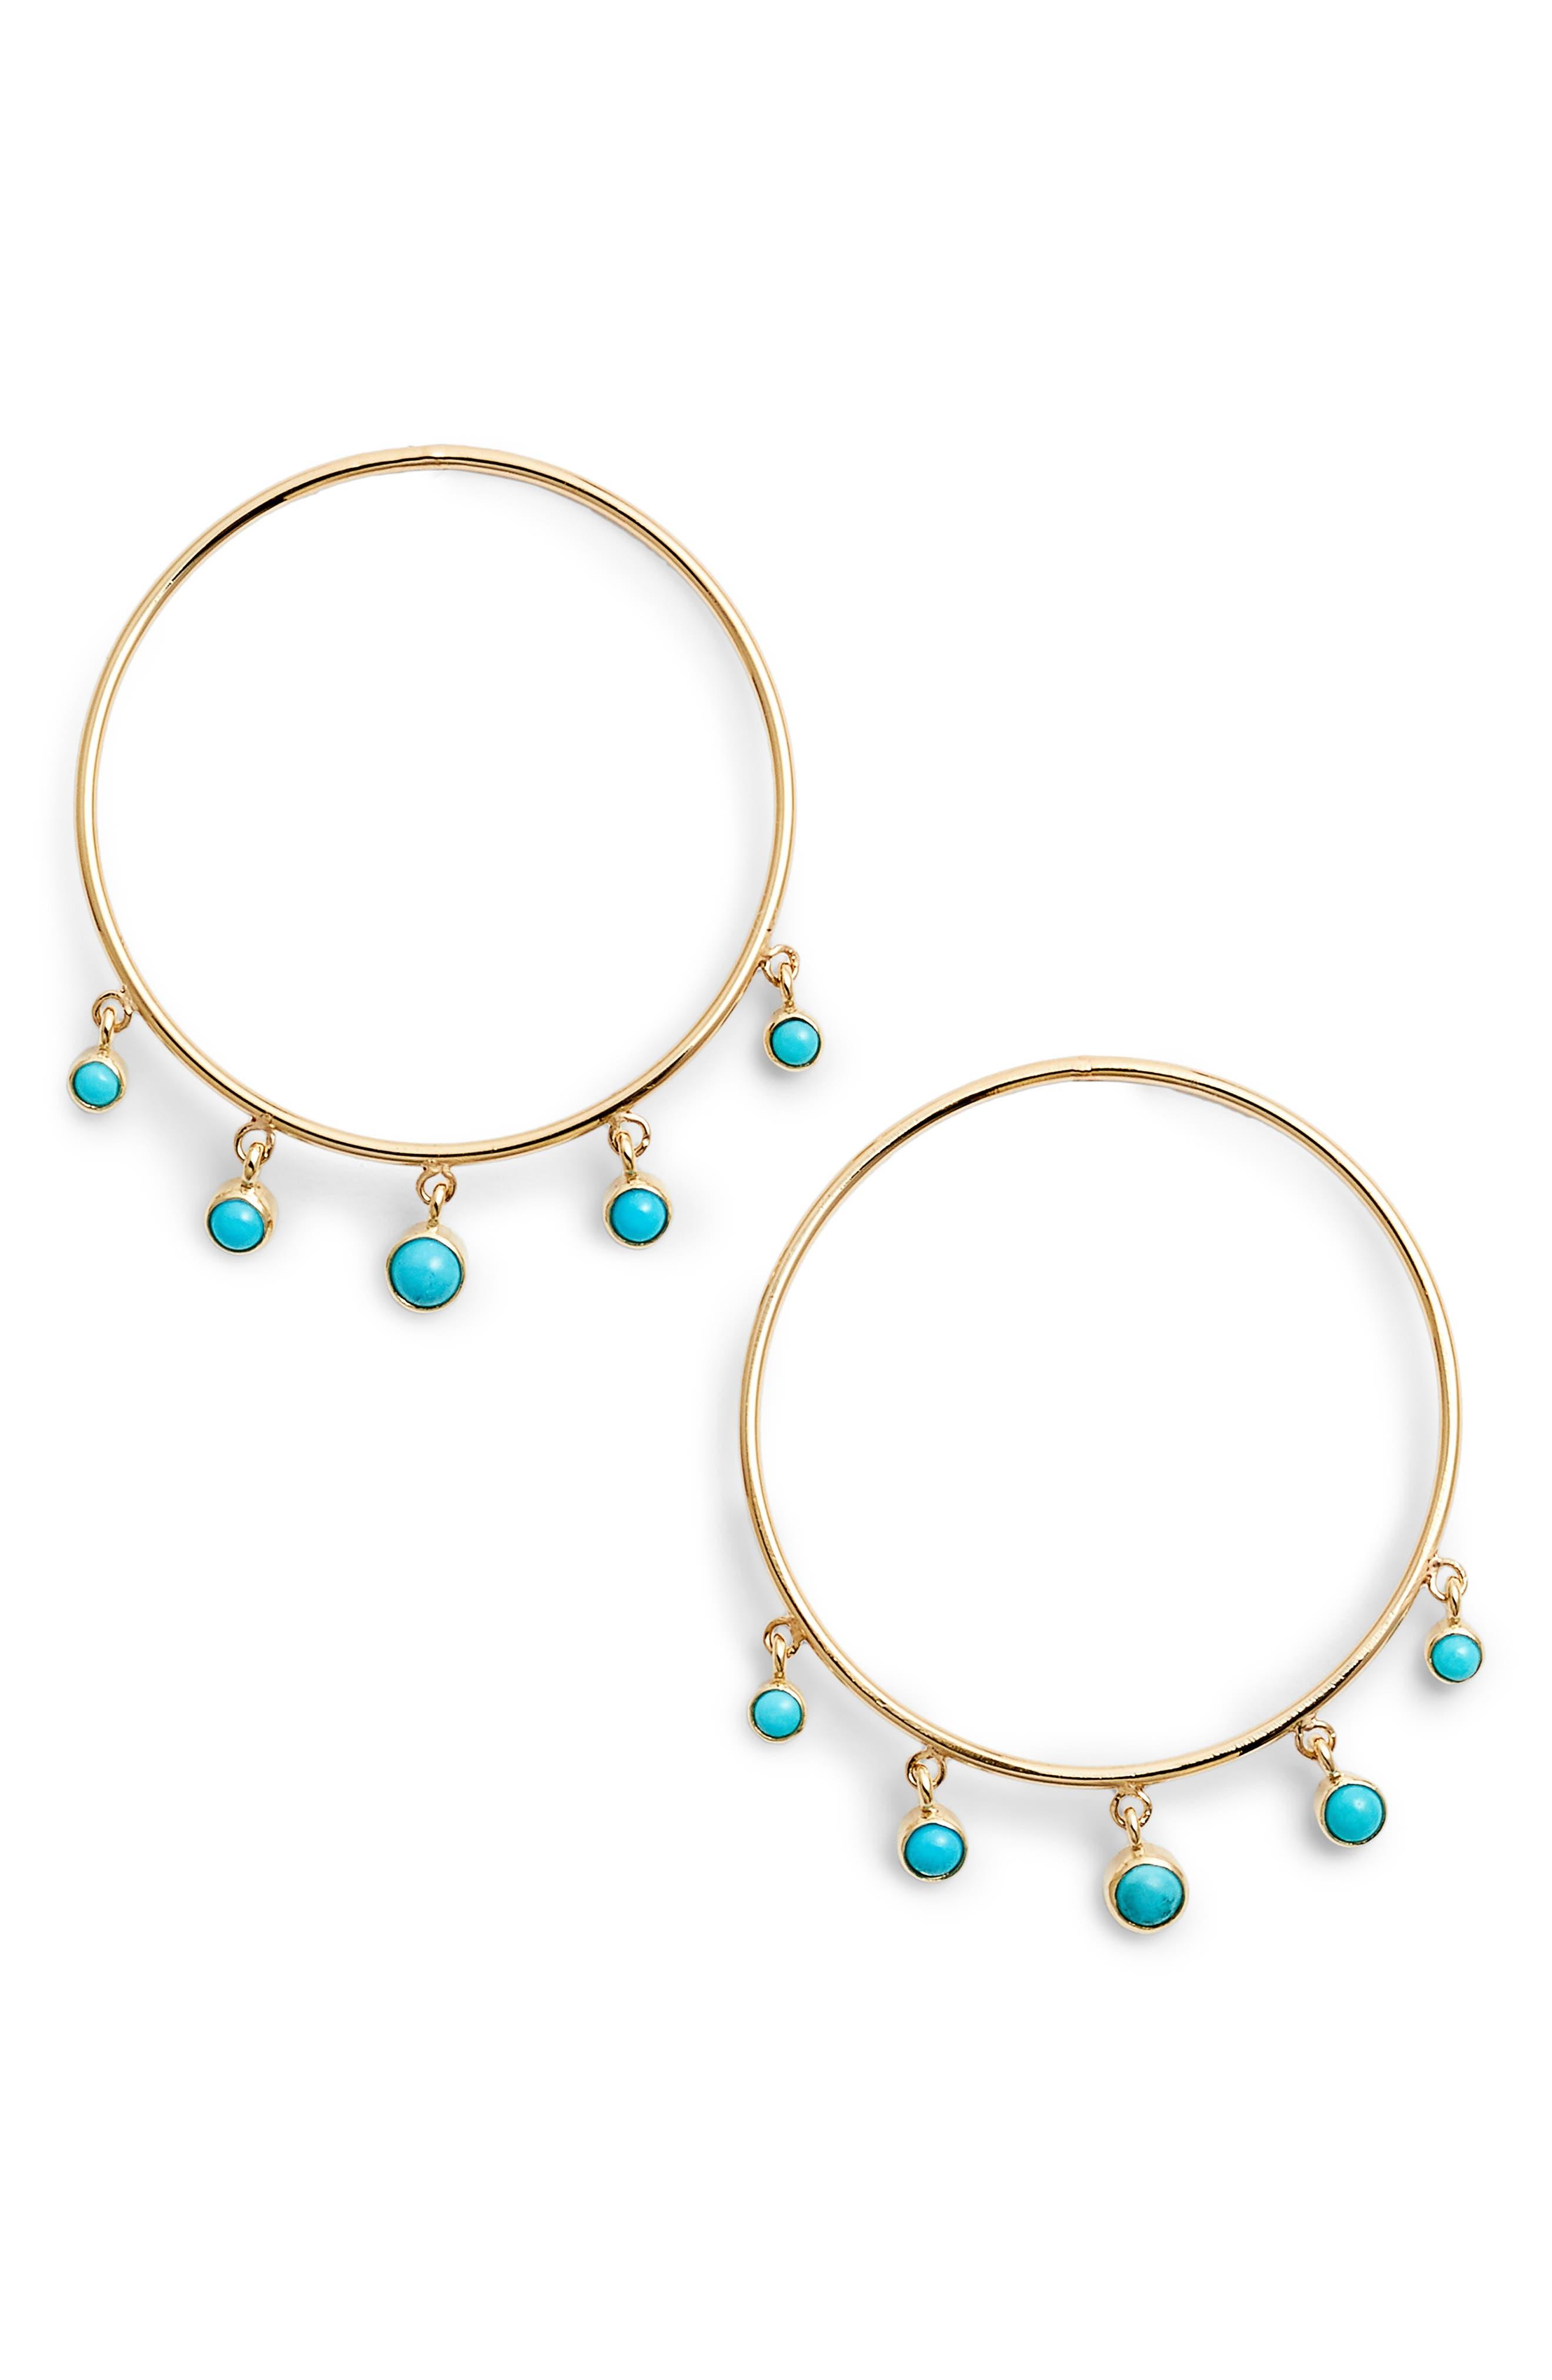 Zoe Chicco Dangling Turquoise Hoop Earrings,                         Main,                         color, Yellow Gold